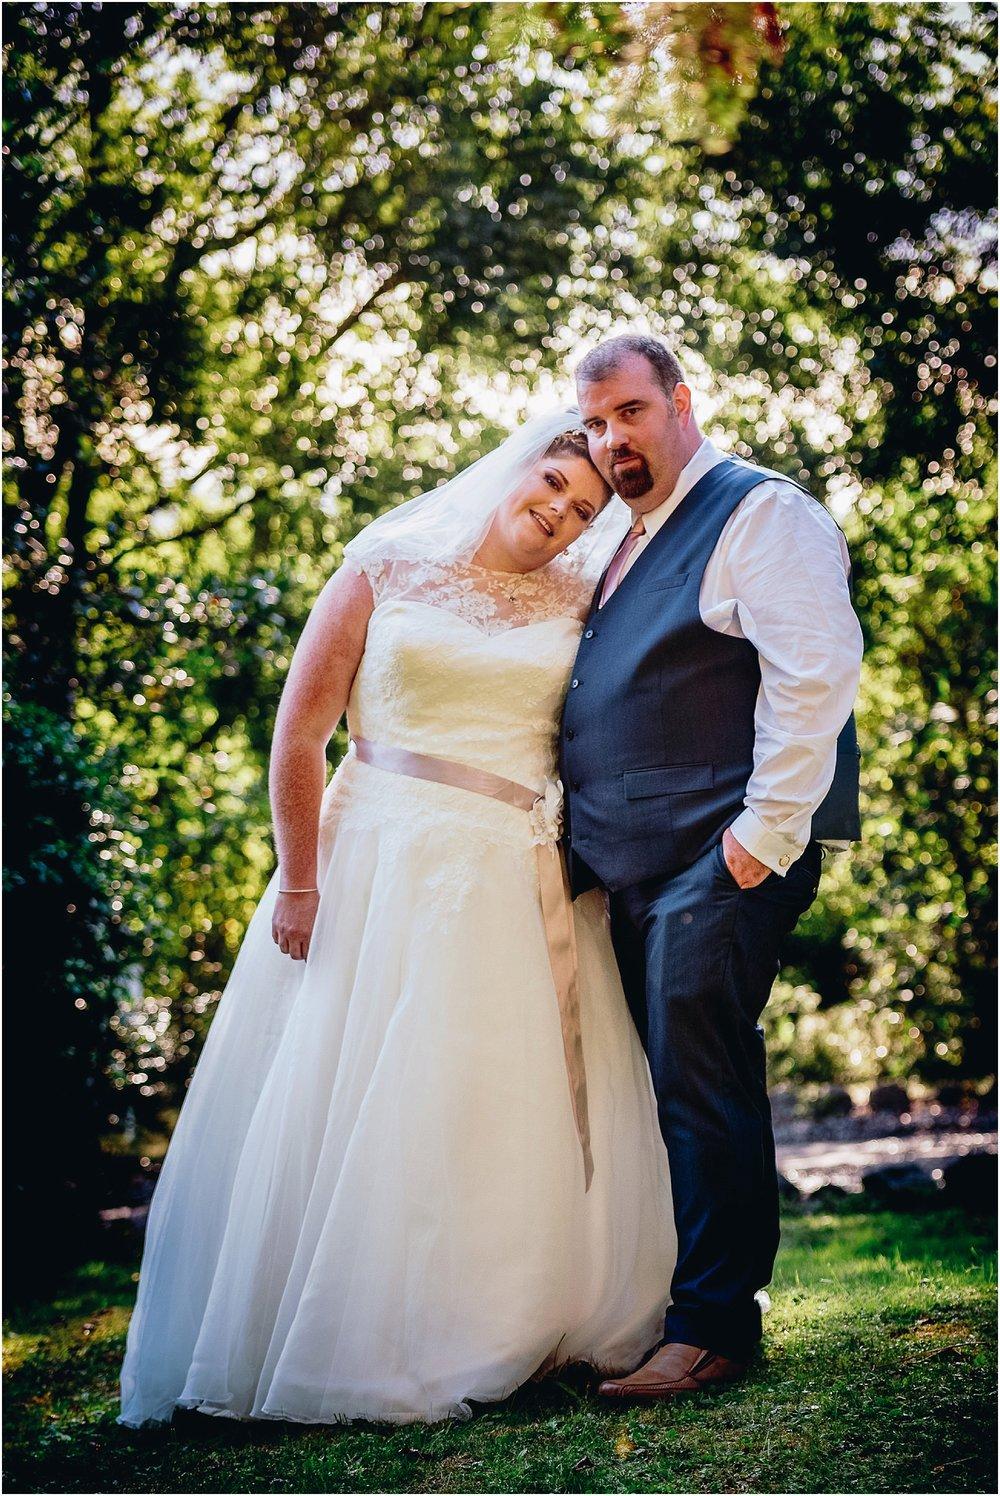 Staffordshire_wedding_photographer-125.jpg